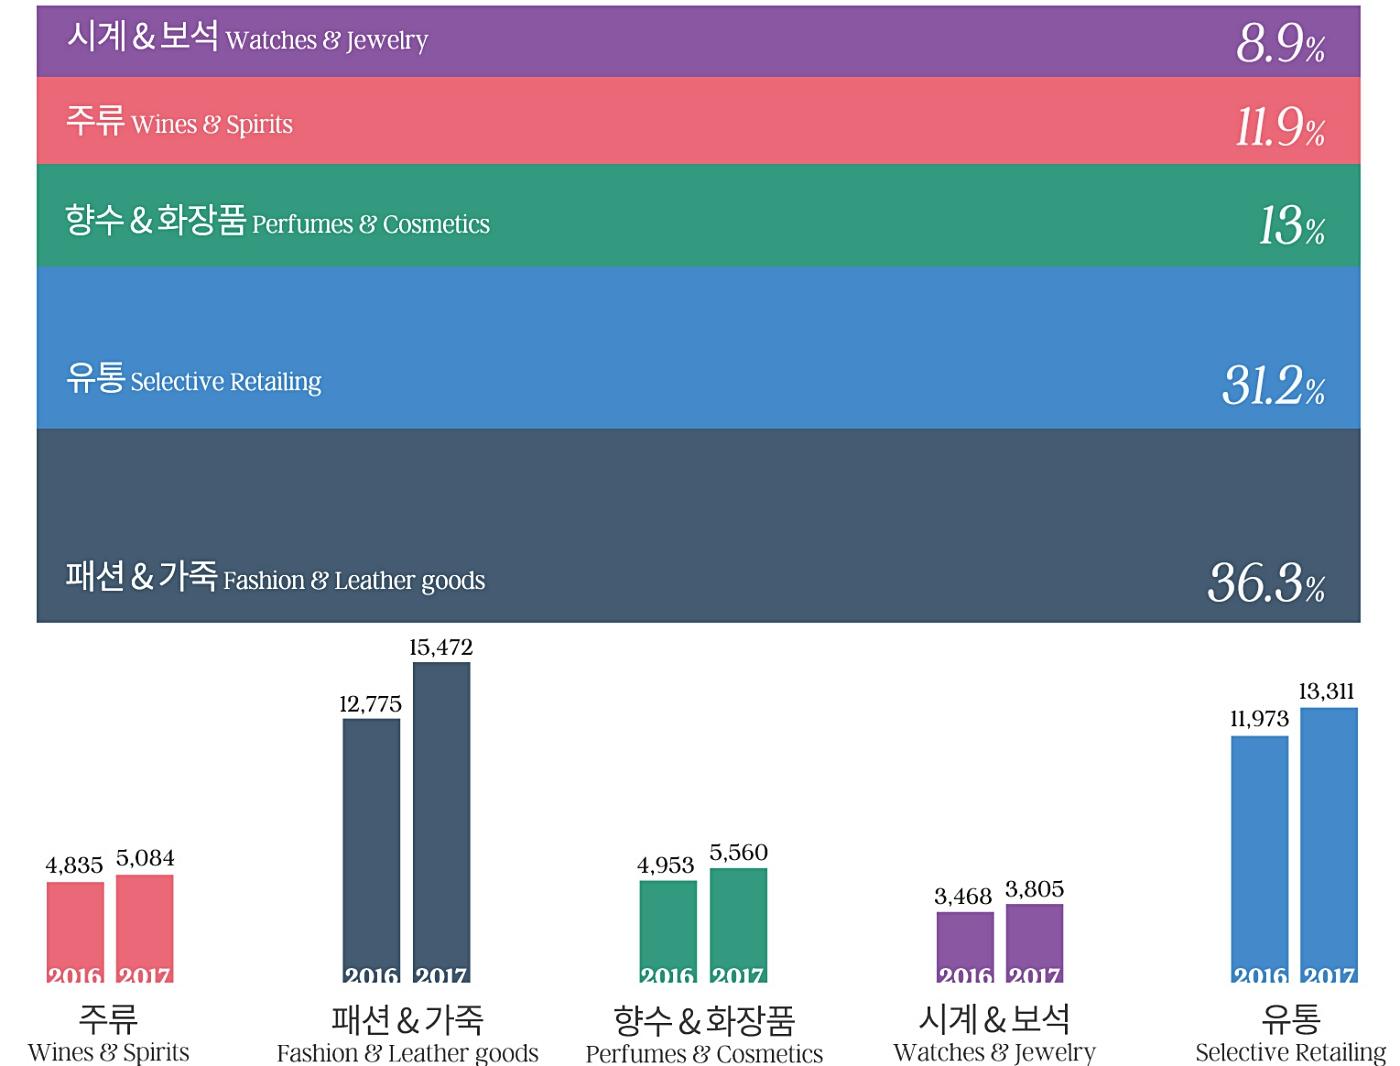 LVMH의 사업 분야 중 패션 & 가죽 사업이 가장 비중이 높다. (데이터 출처: LVMH 2017 Year Result) / 그래픽: 김영미